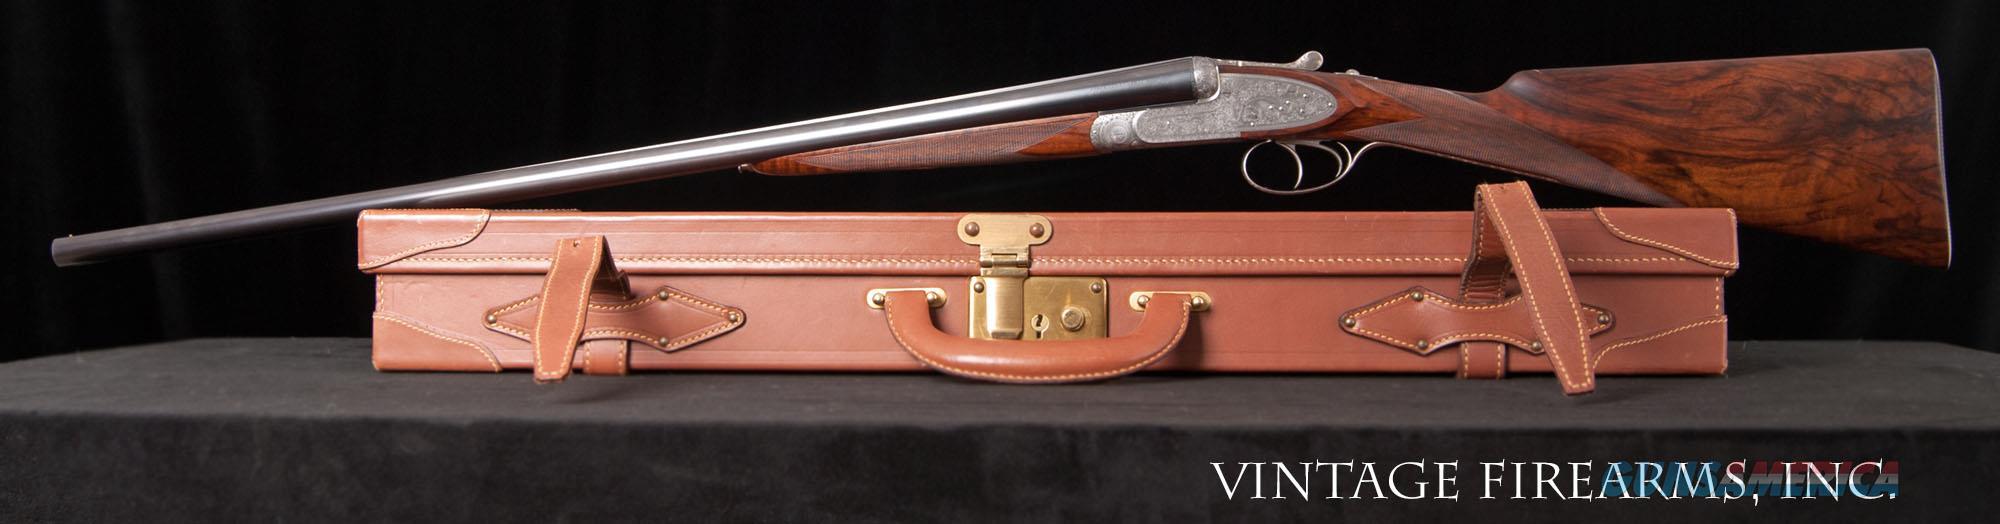 "Piotti King ""Royal"" 20 GAUGE Shotgun - AS NEW, CASED 28"" CHOPPER LUMP BARRELS, vintage firearms inc   Guns > Shotguns > Piotti Shotguns"